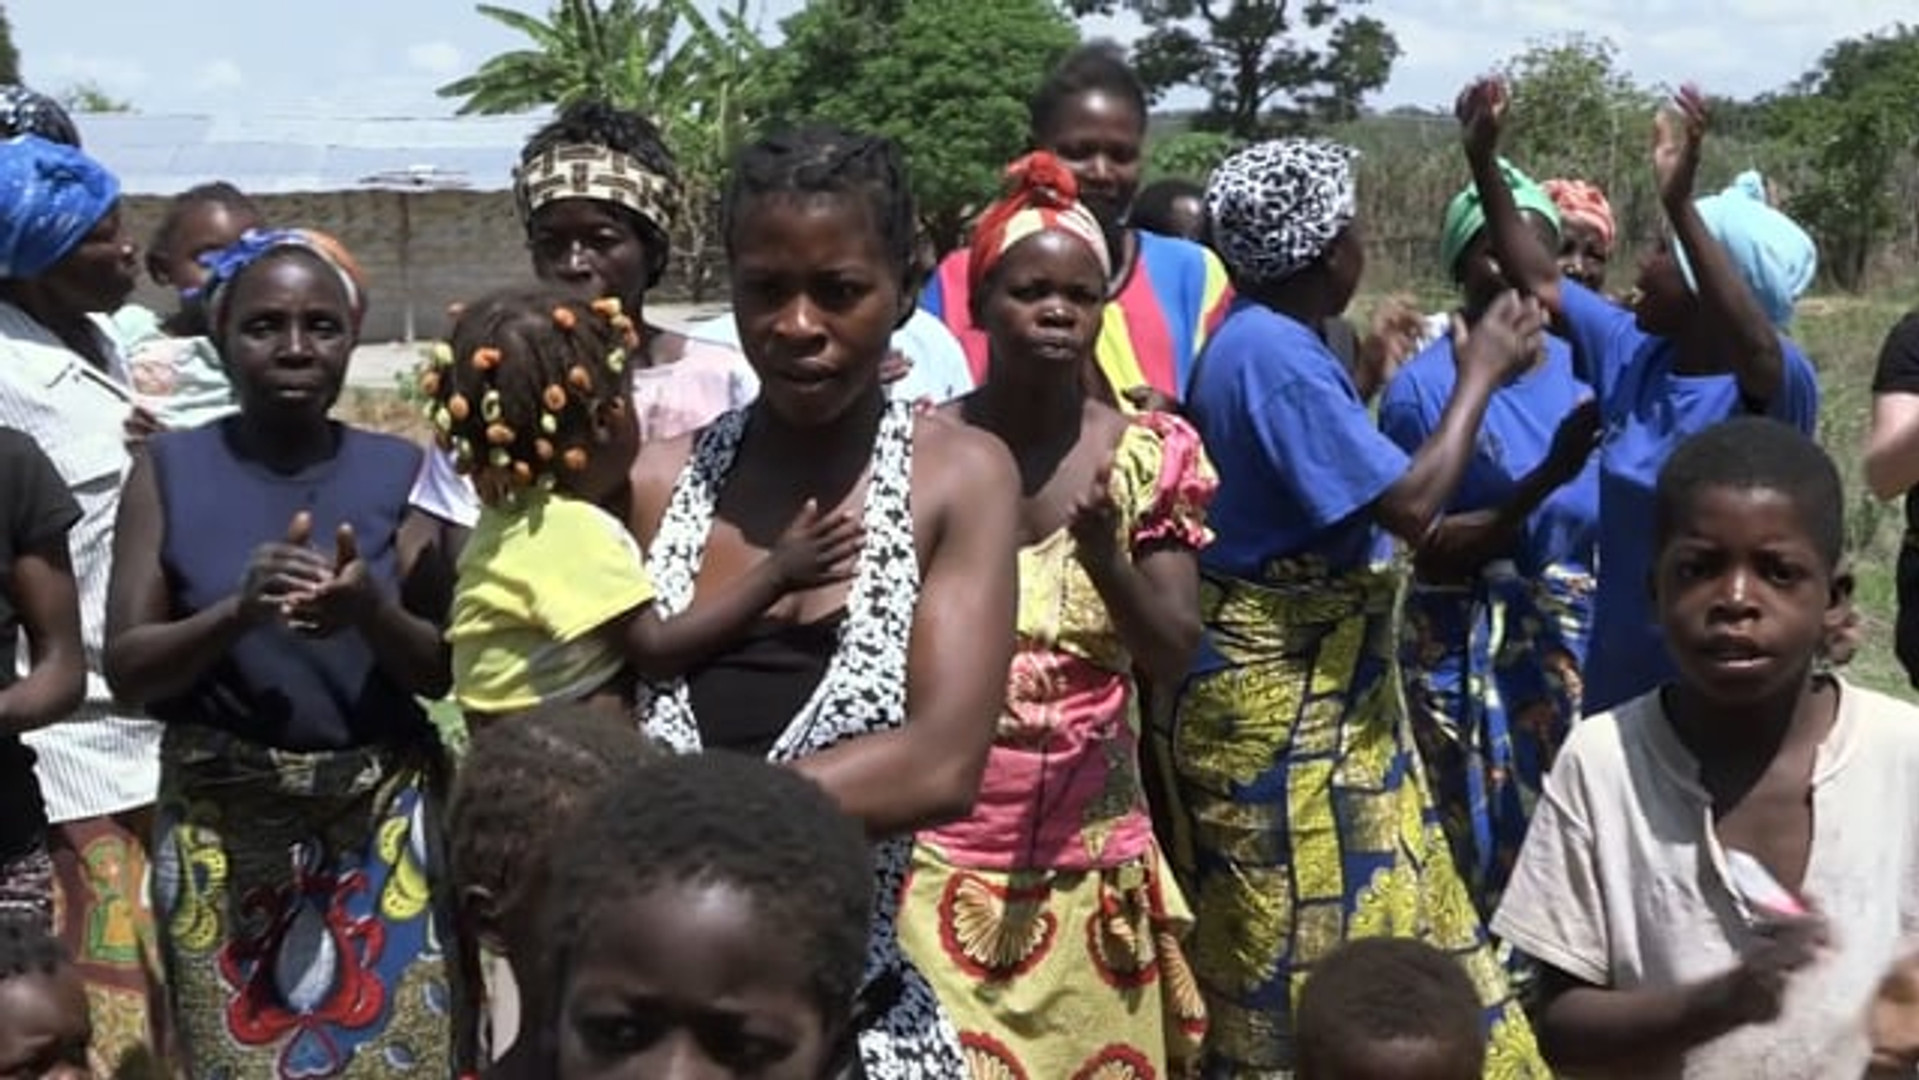 LWF - Documentary in Angola